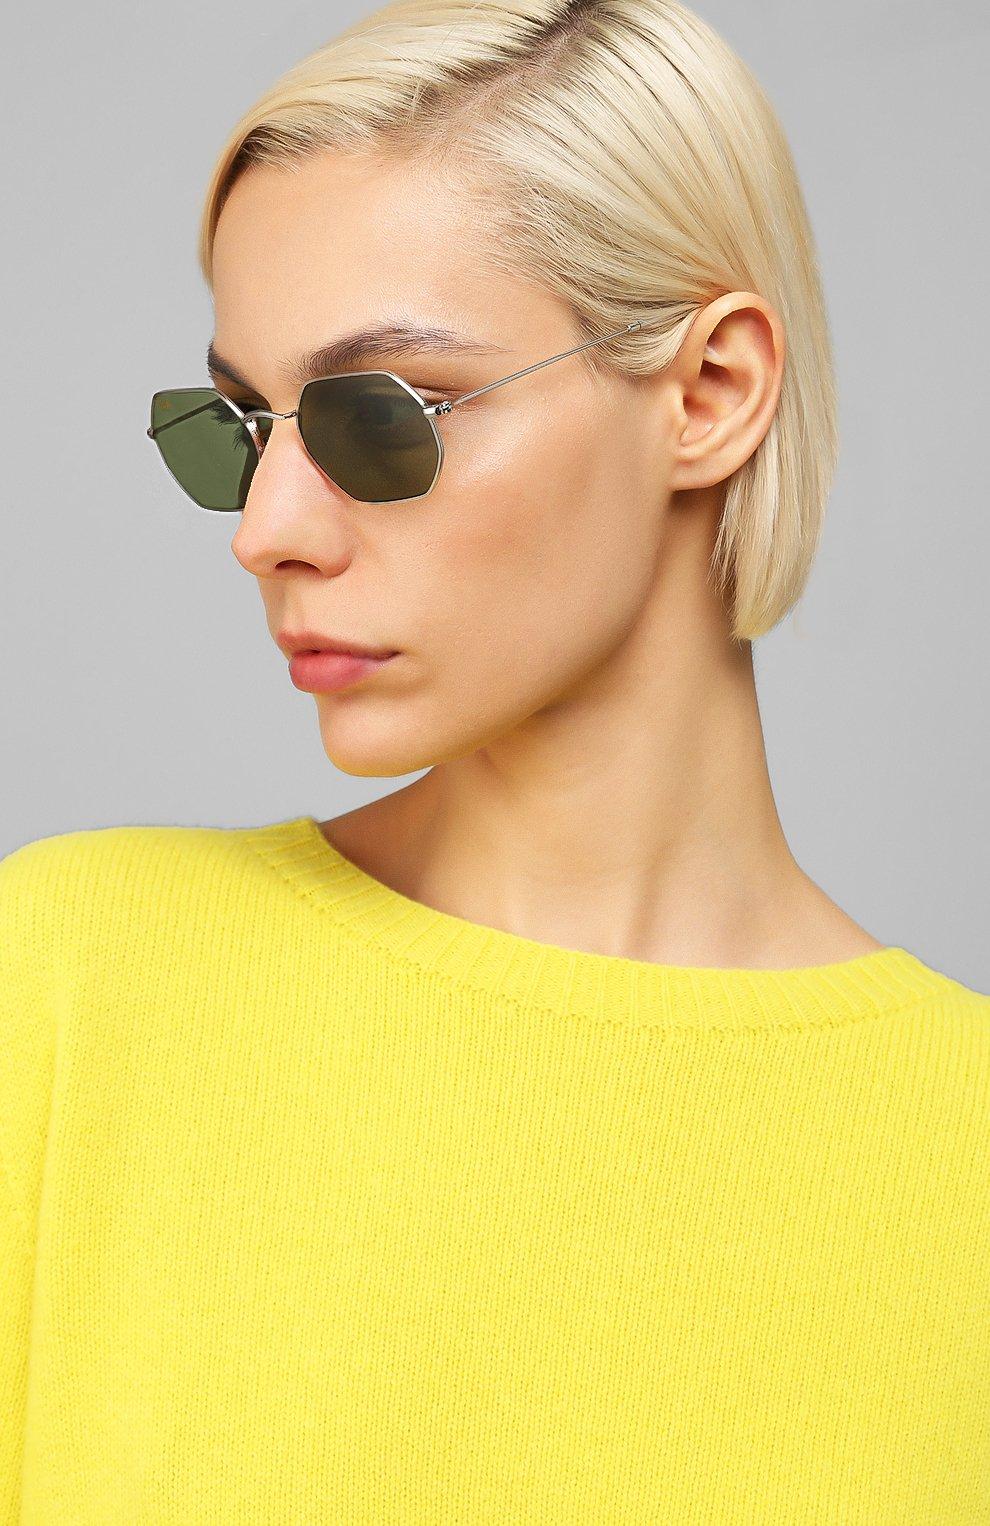 Женские солнцезащитные очки RAY-BAN зеленого цвета, арт. 3556-91984E   Фото 2